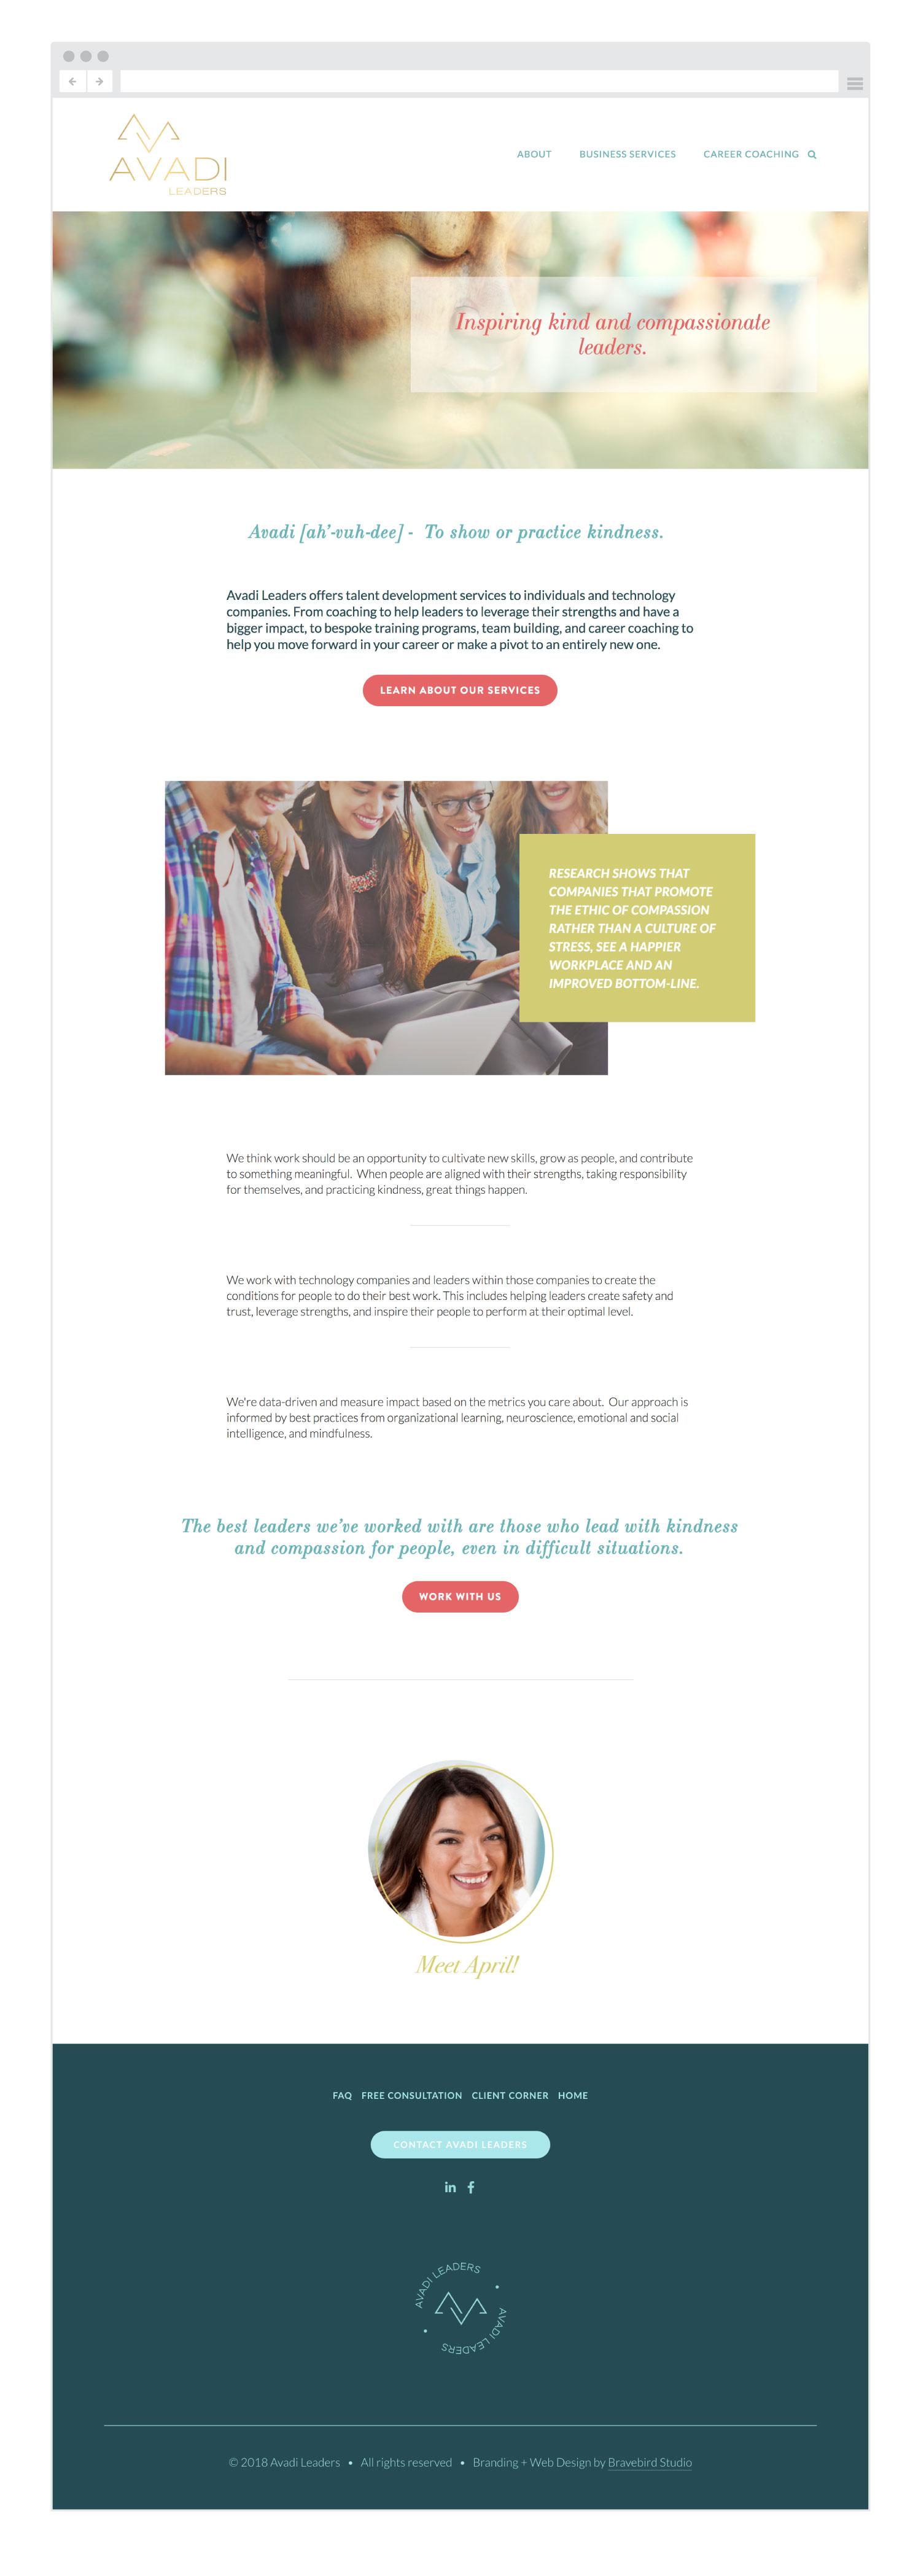 Avadi Leaders | Branding & Web Design | Bravebird Studio